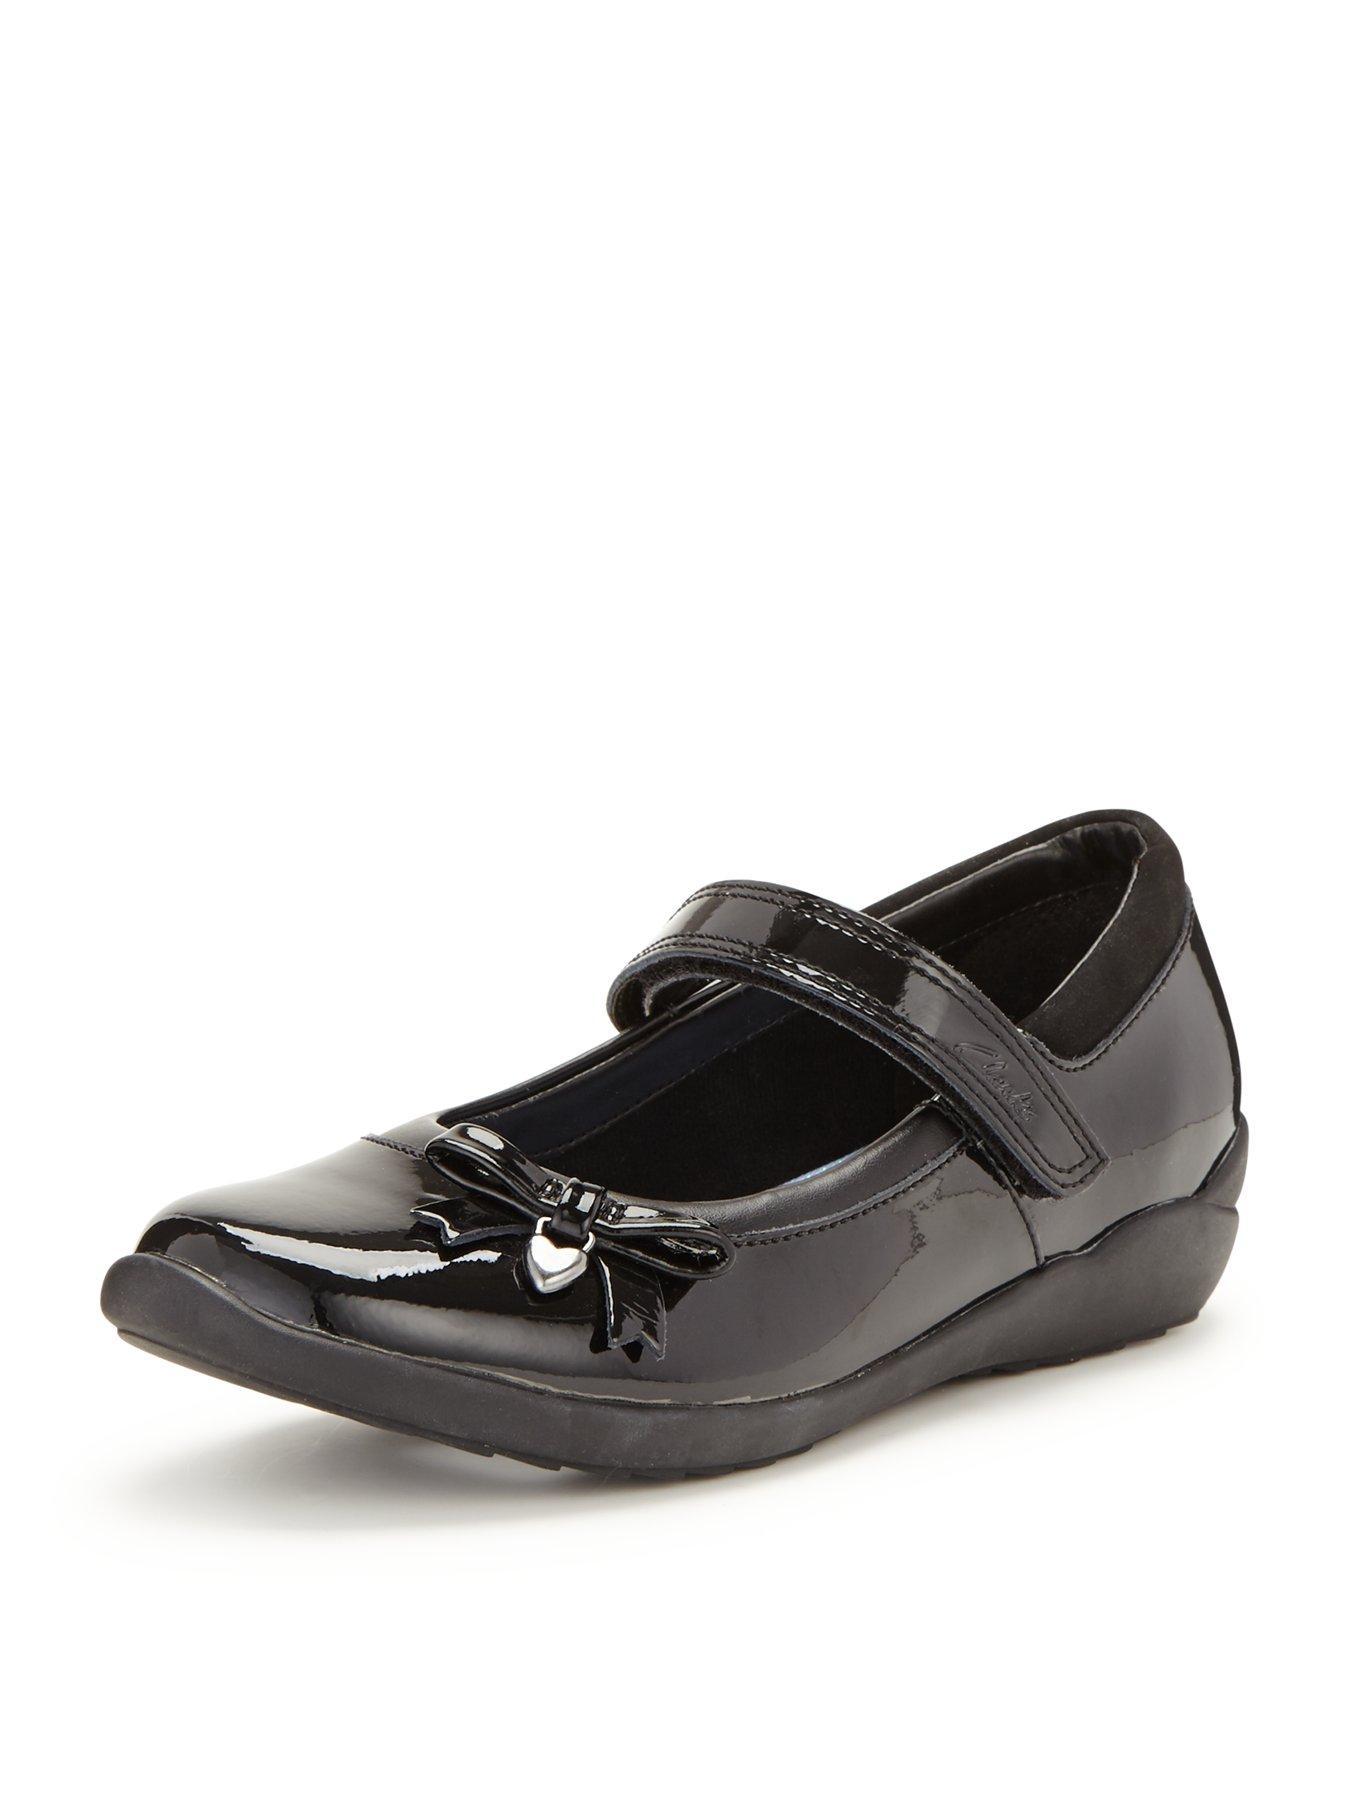 childrens clarks shoes online ireland